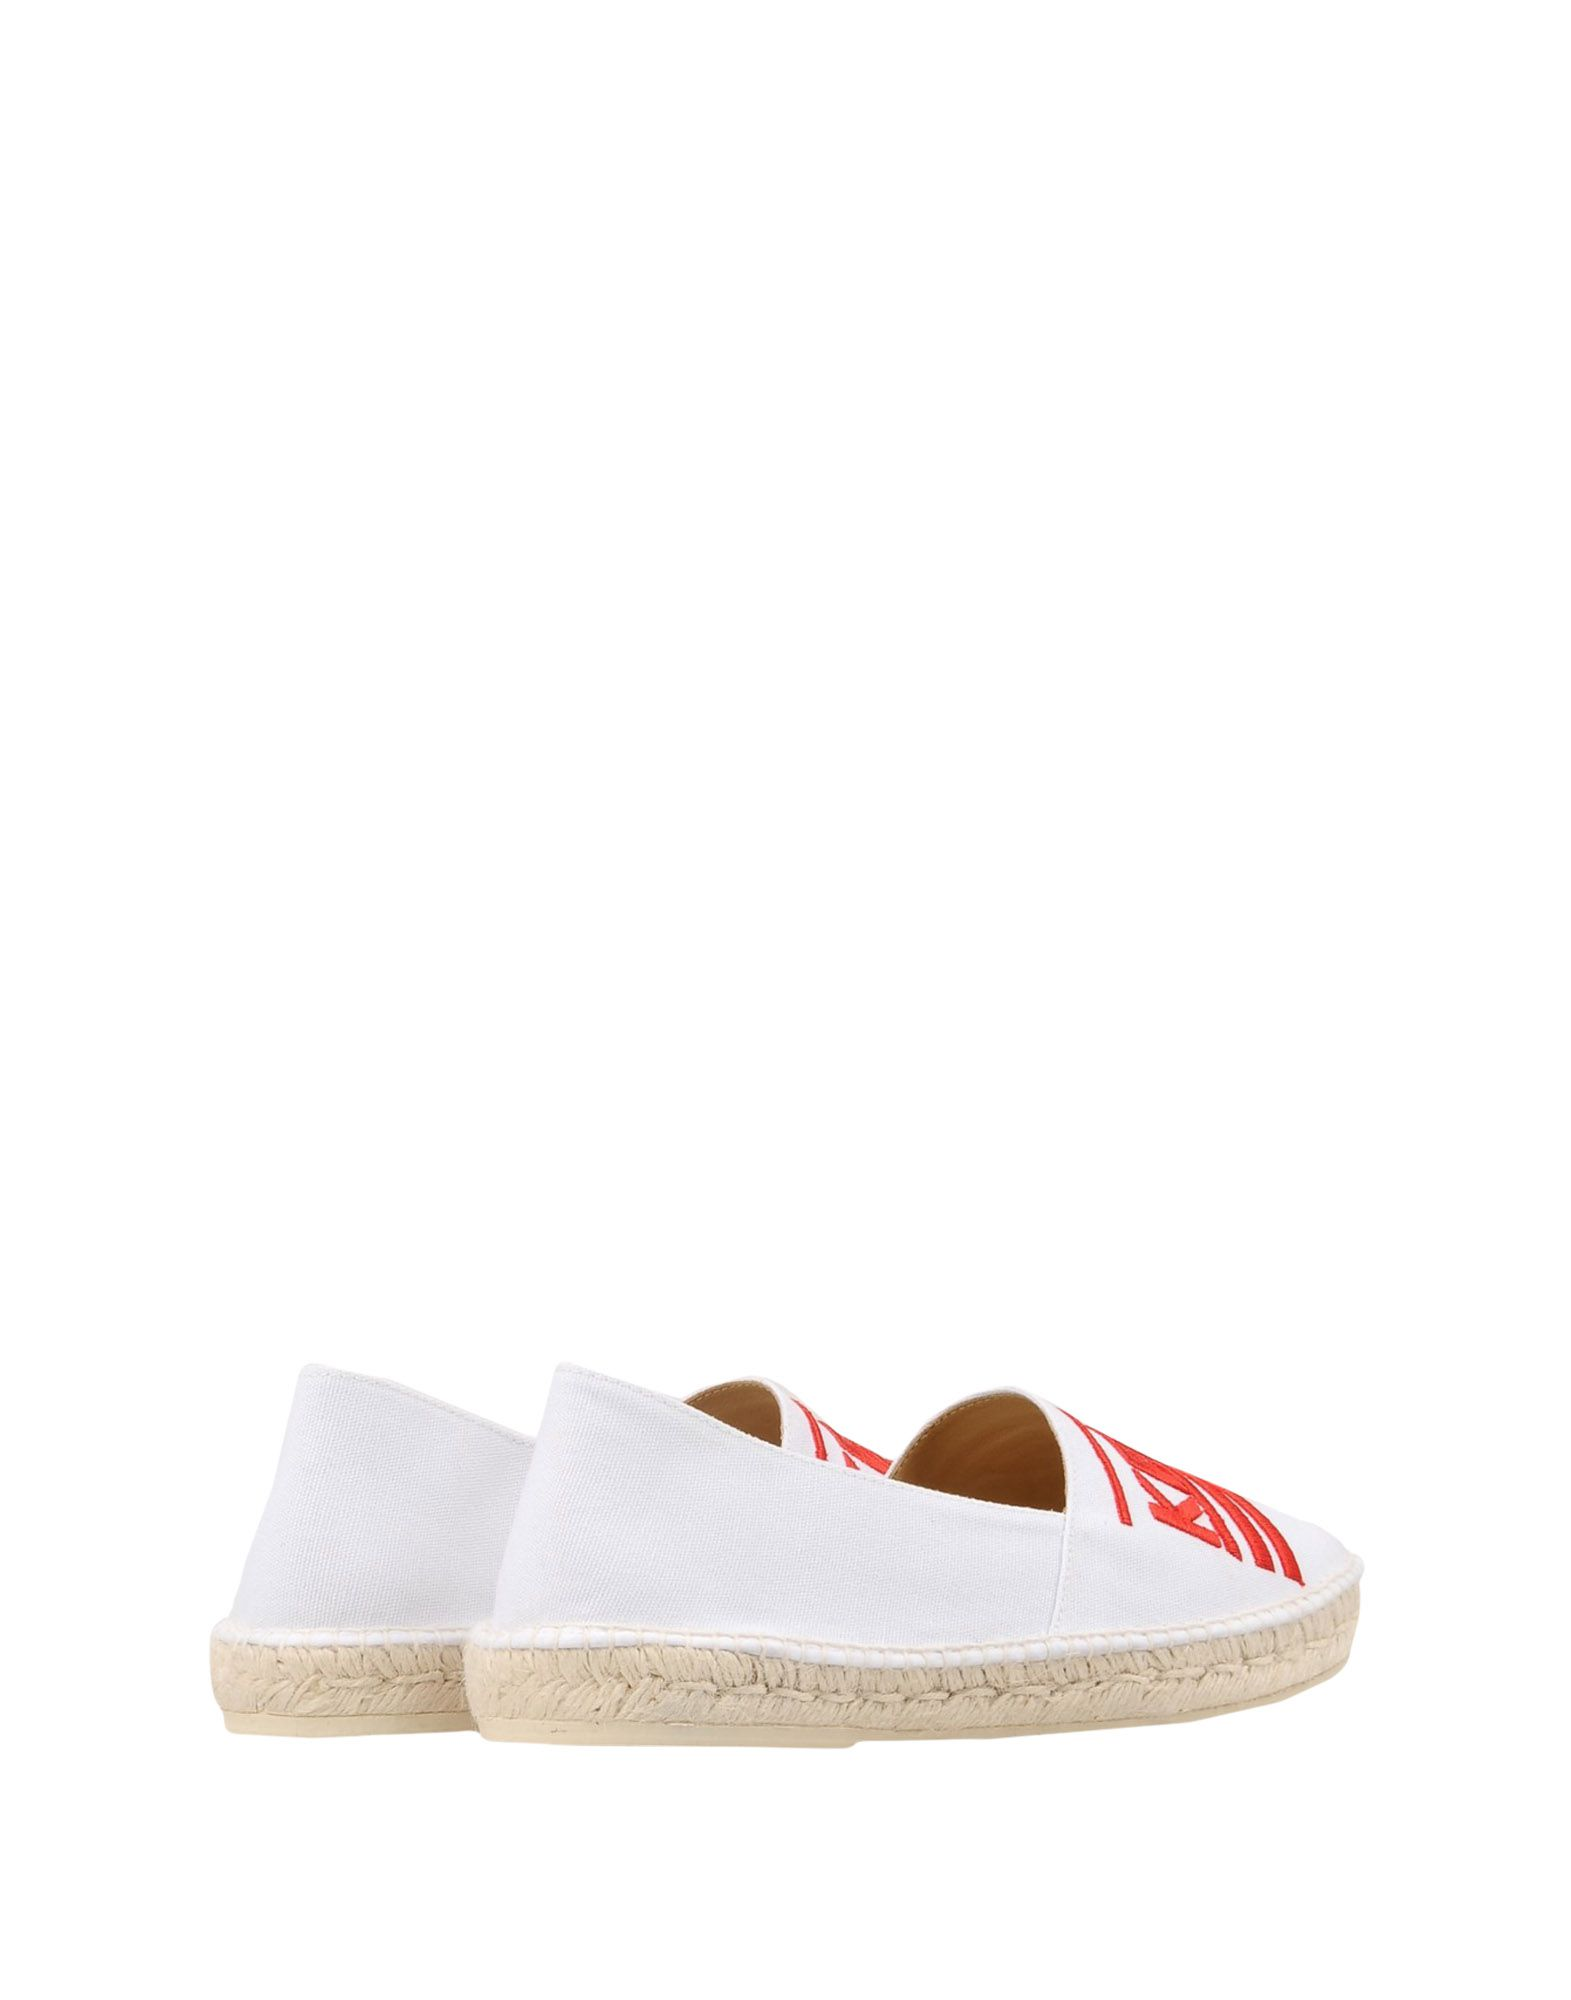 Kenzo Classic Gute Espadrille Logo  11430933IP Gute Classic Qualität beliebte Schuhe fcb284